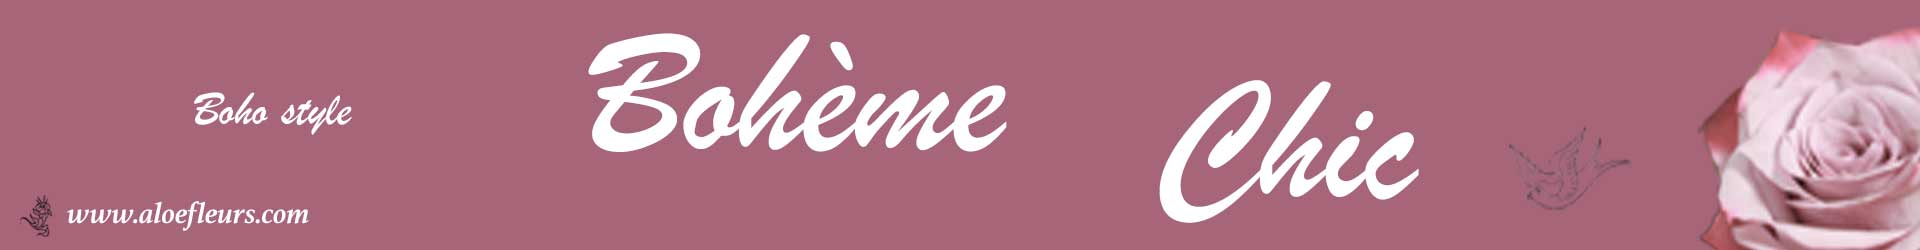 slide-bohème-chic